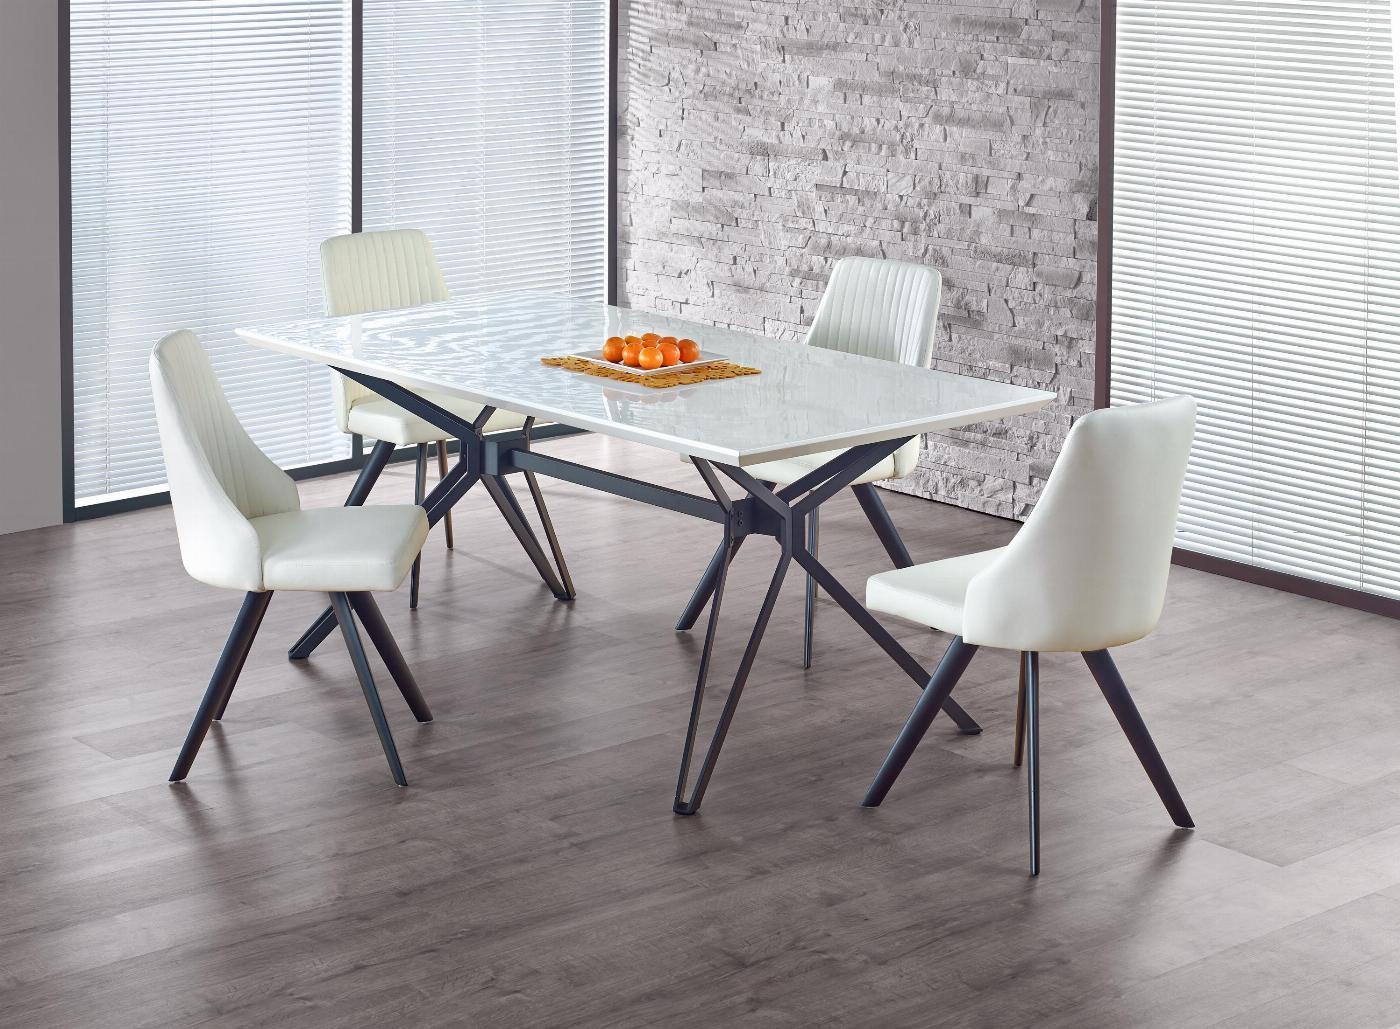 PASCAL stół biało - czarny (2p=1szt)